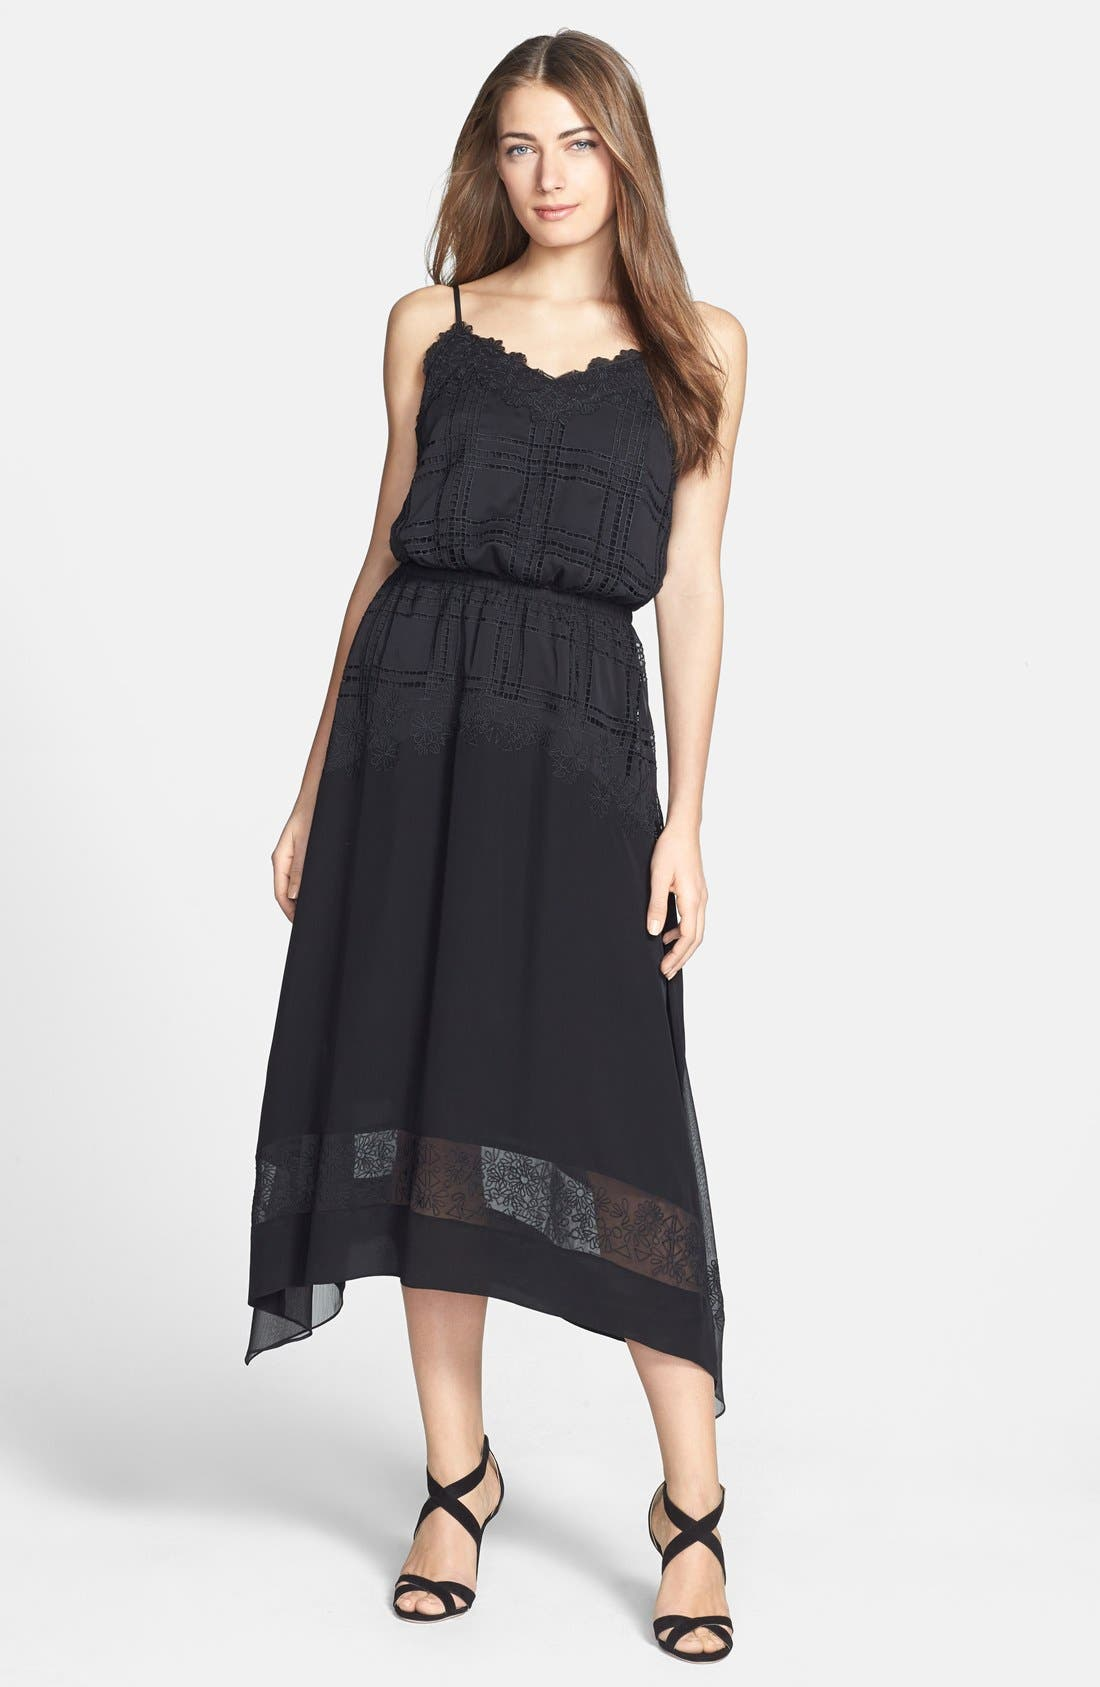 Main Image - Rebecca Minkoff 'Suarez' Embroidered Silk Blouson Dress